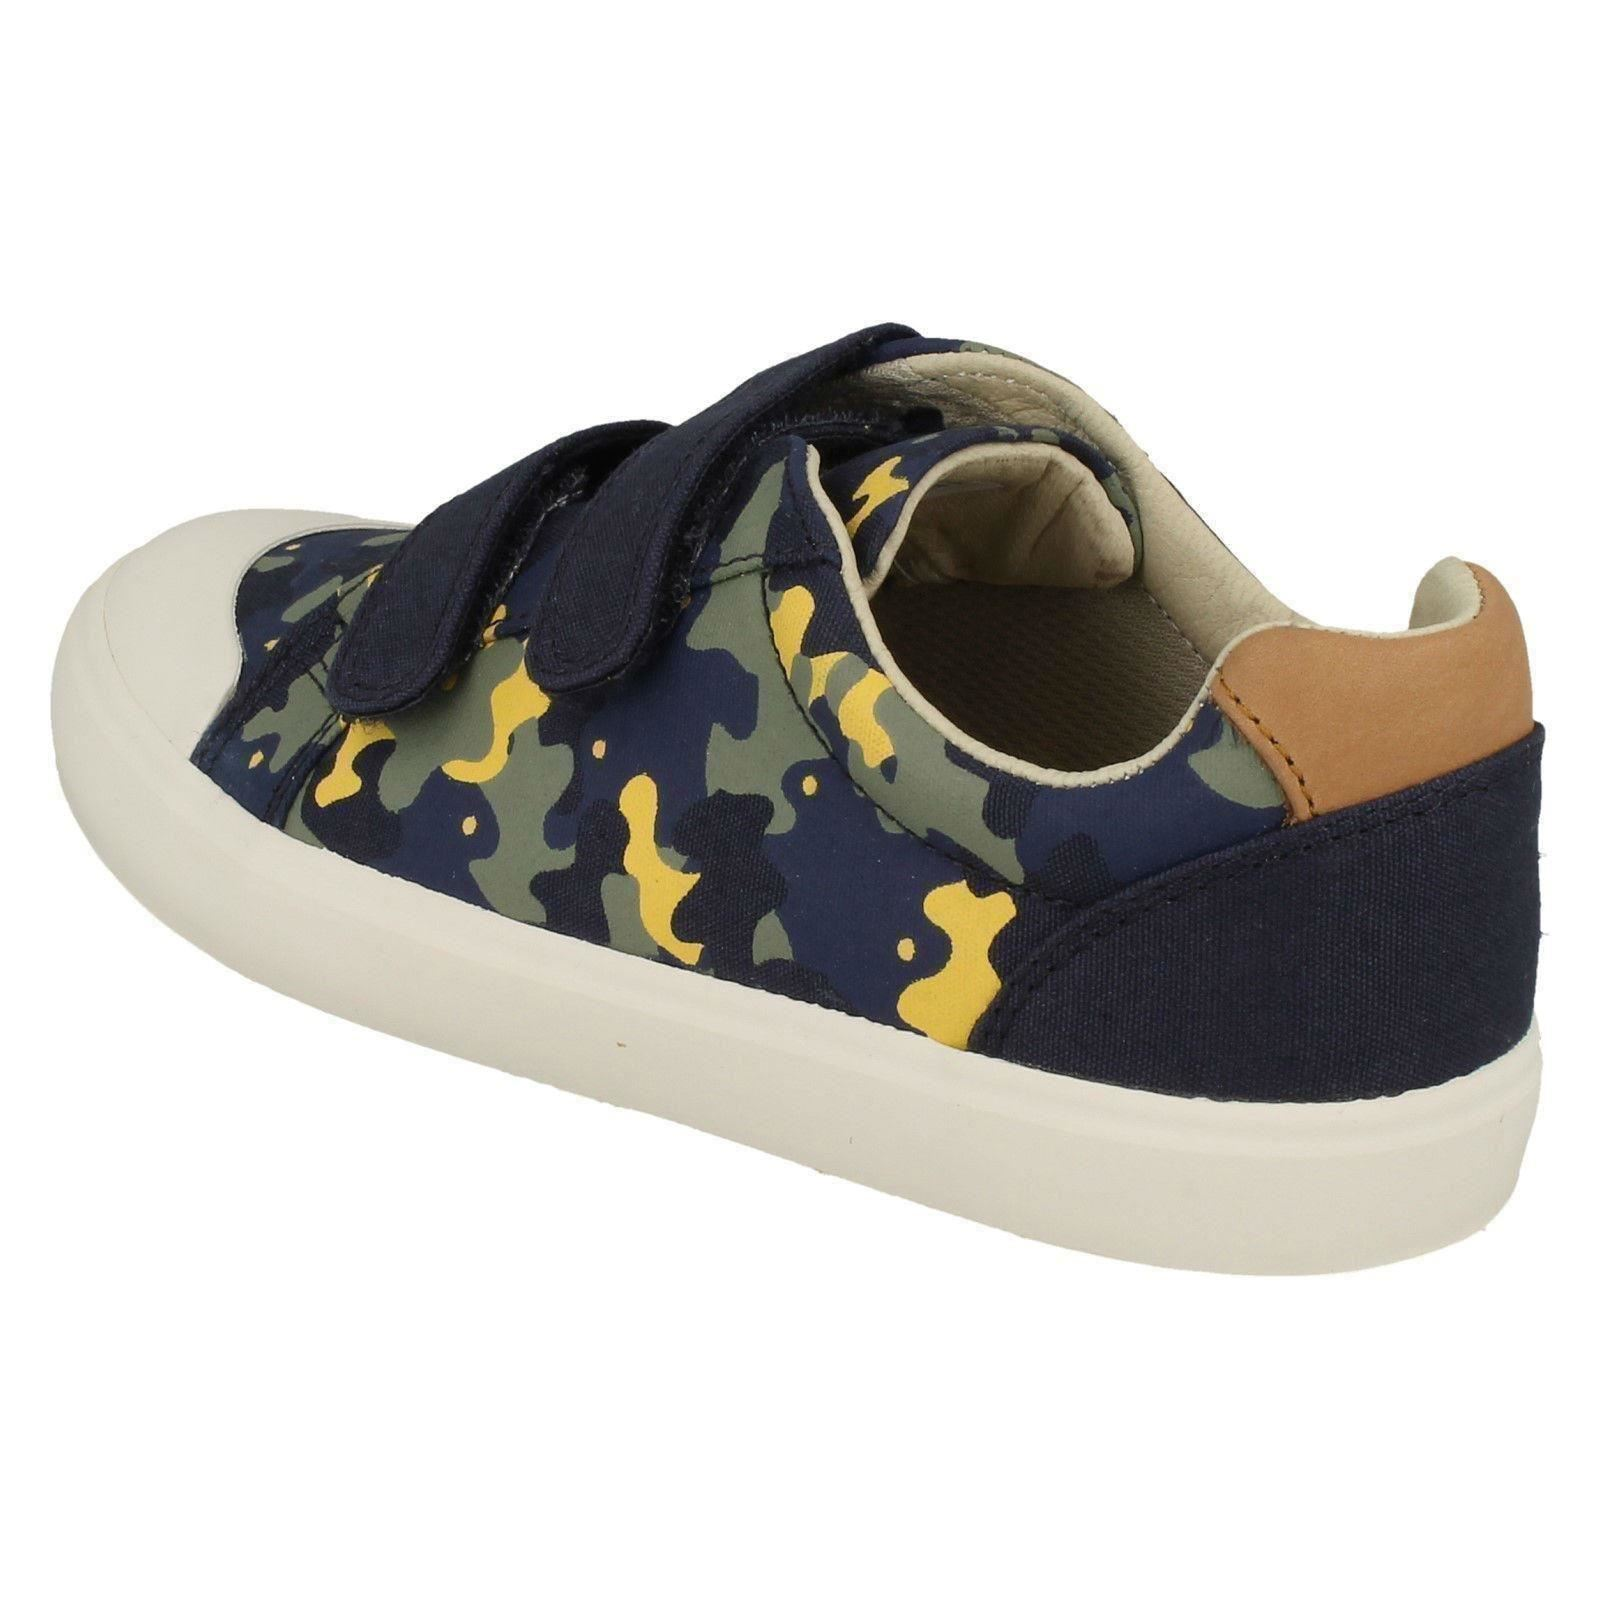 Boys Clarks Comic Air Canvas Shoes